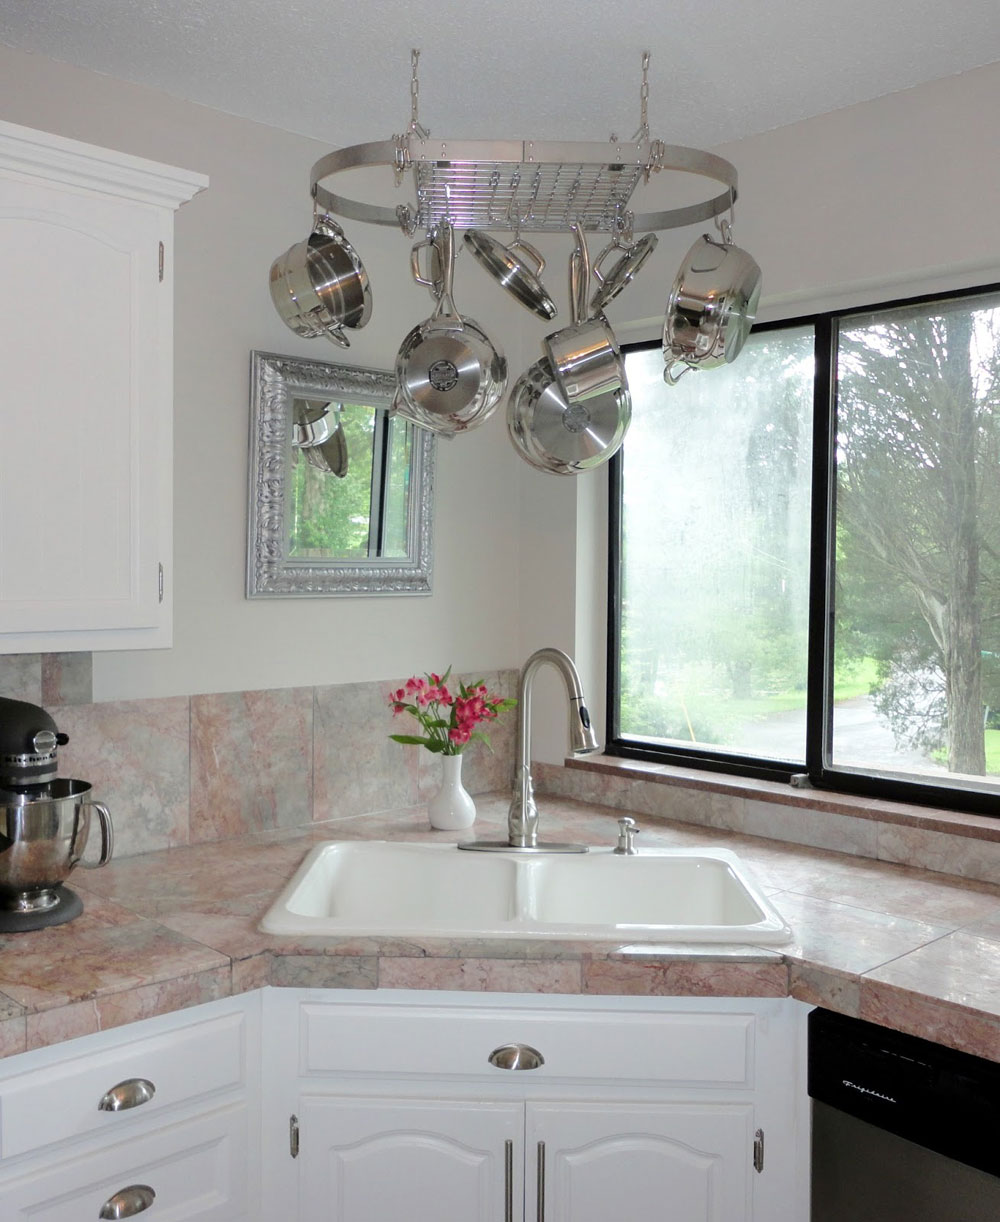 Corner Kitchen Sink Decorating Ideas Novocom Top